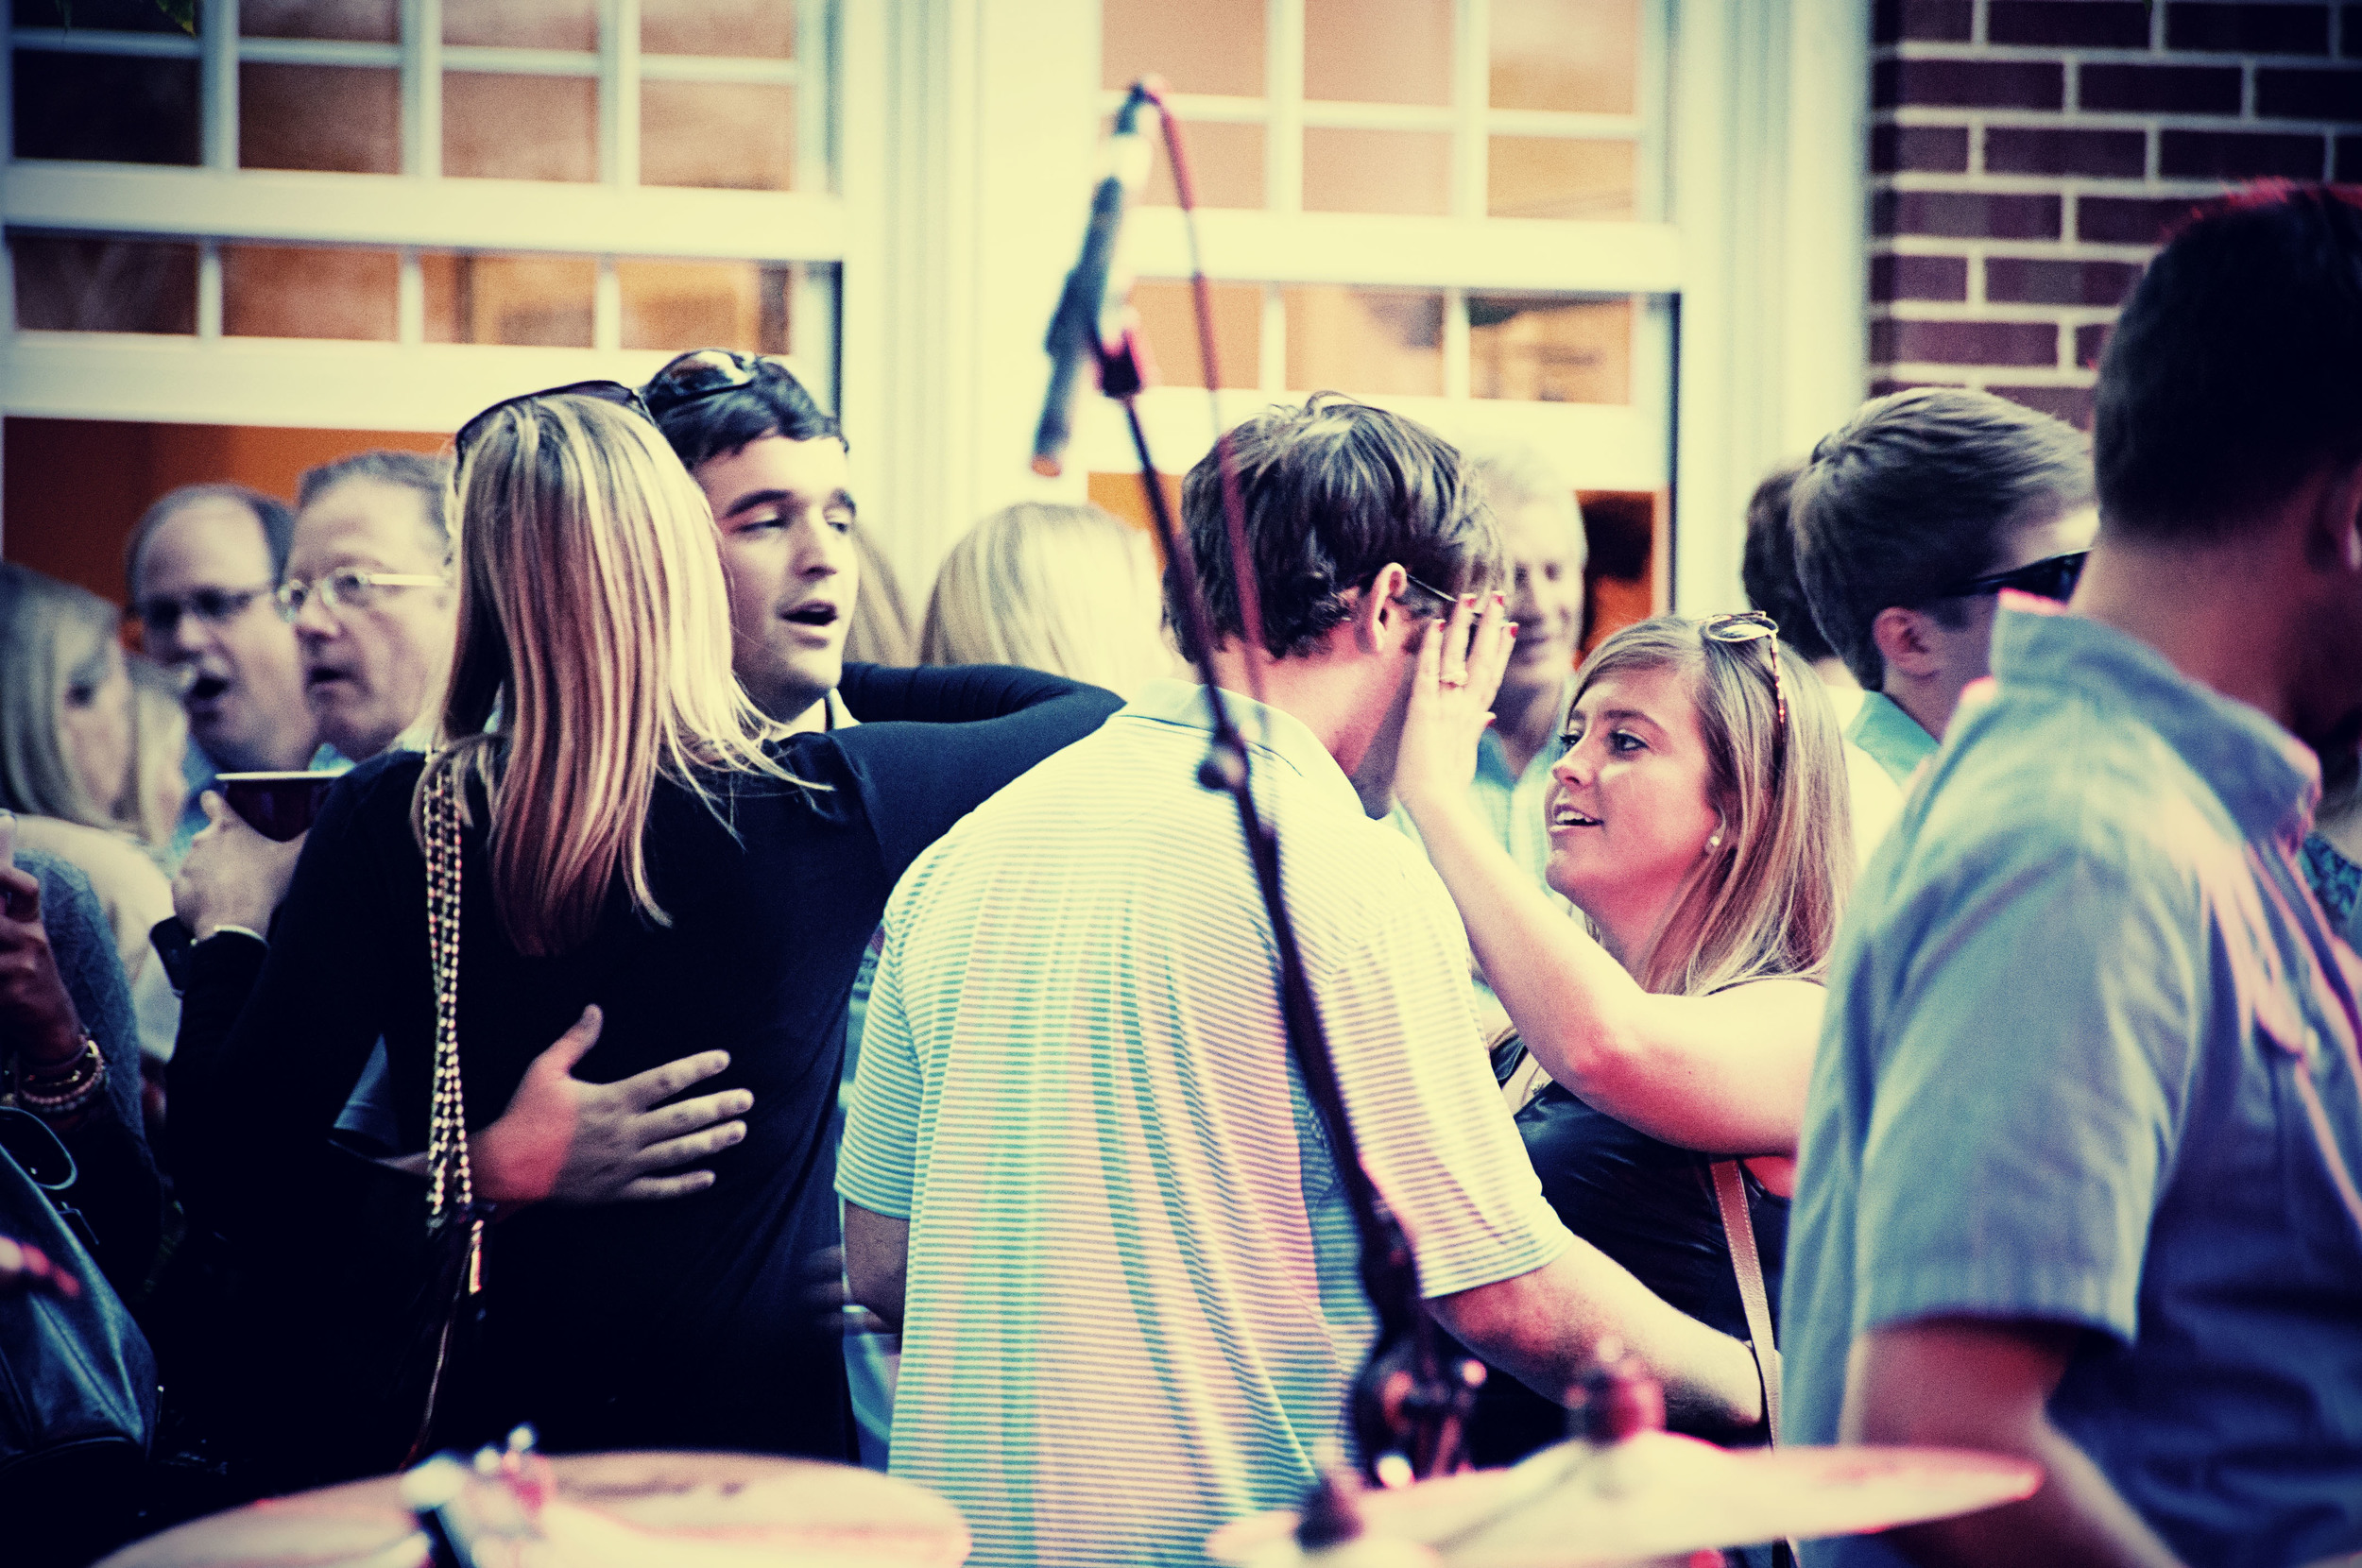 University of North Carolina - Chapel Hill - DKE moment 10-05